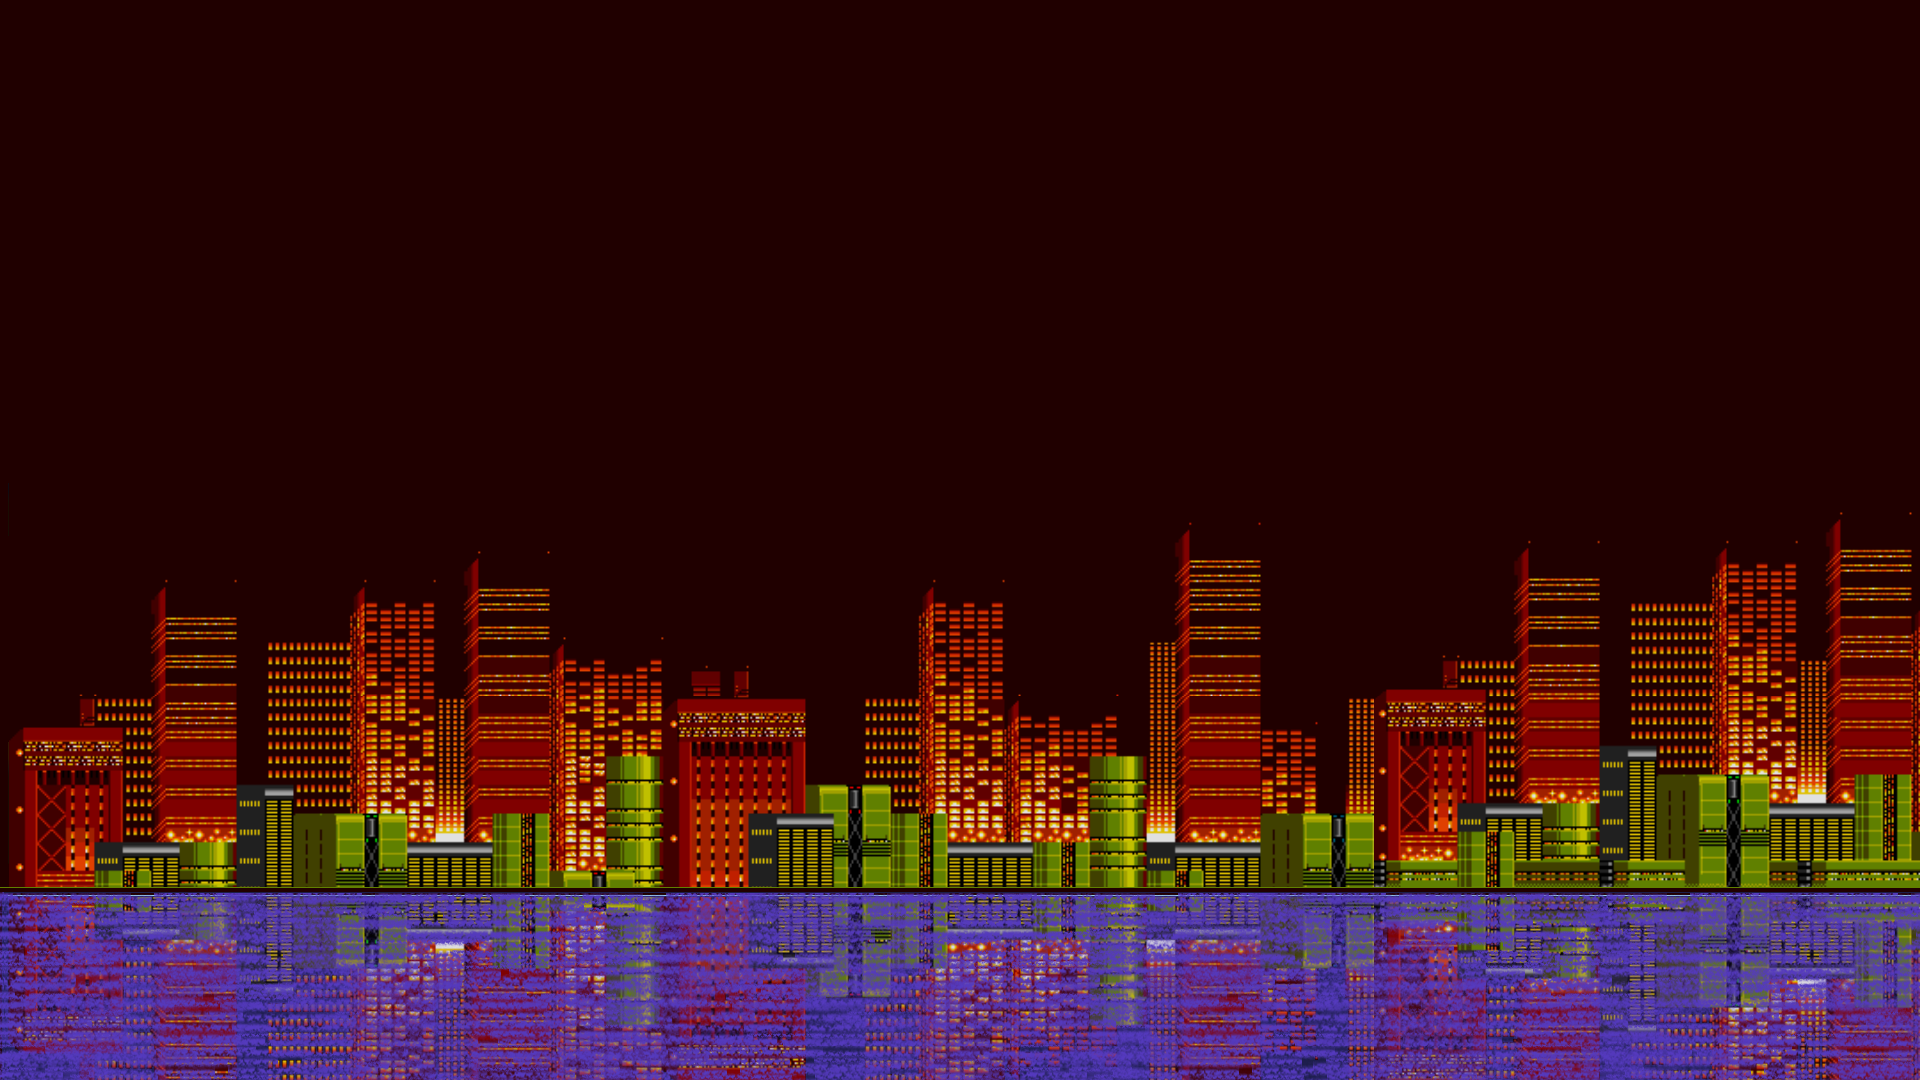 Android Wallpaper 8 Bit Landscapes 1920x1200. Download resolutions: Desktop: 1920x1080 ...